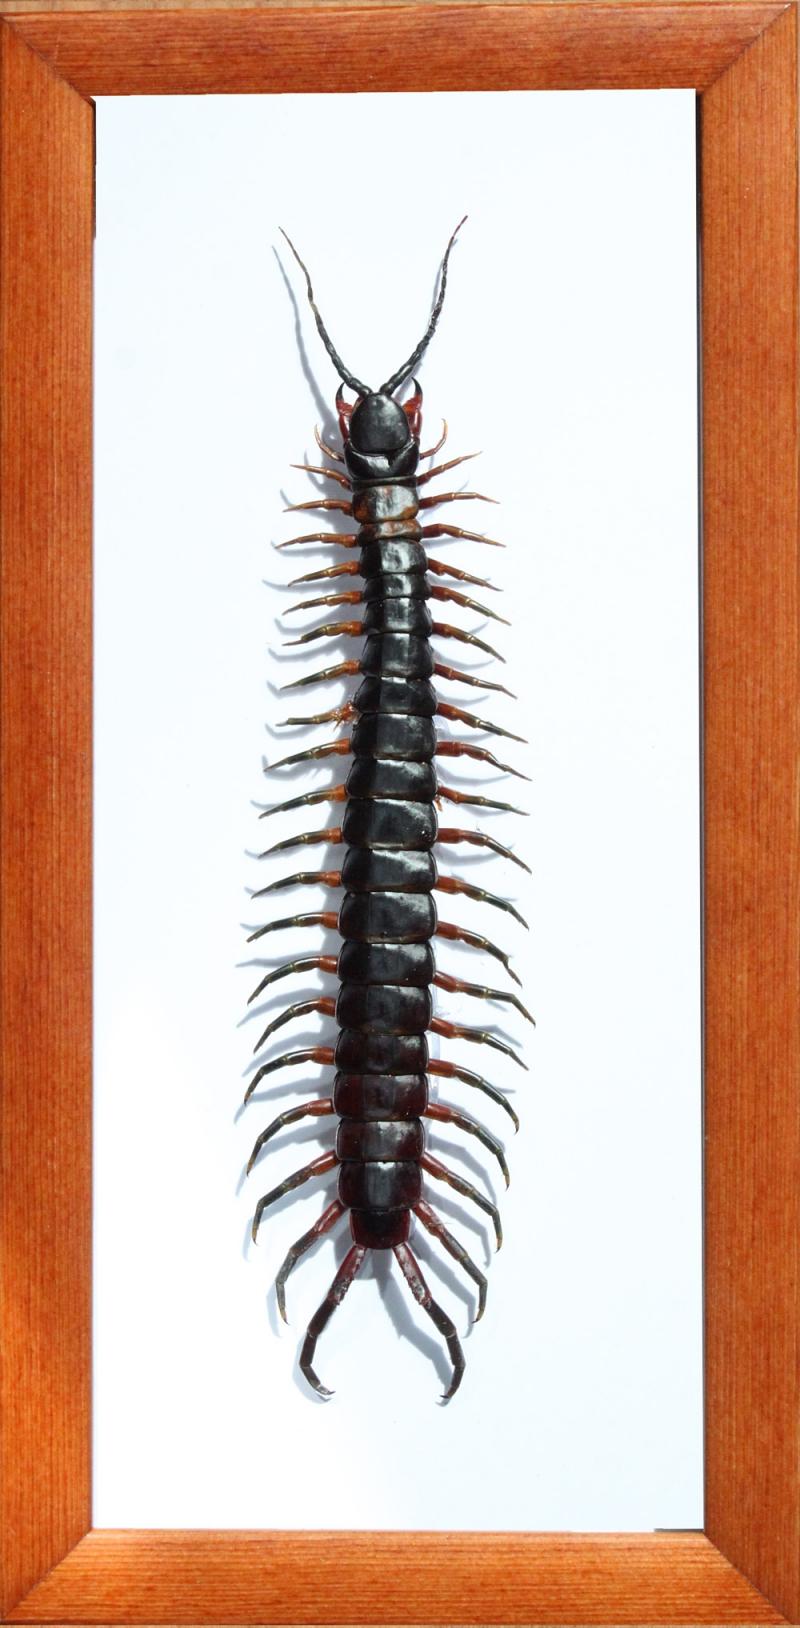 Сколопендра гигантская. Scolopendra gigantea